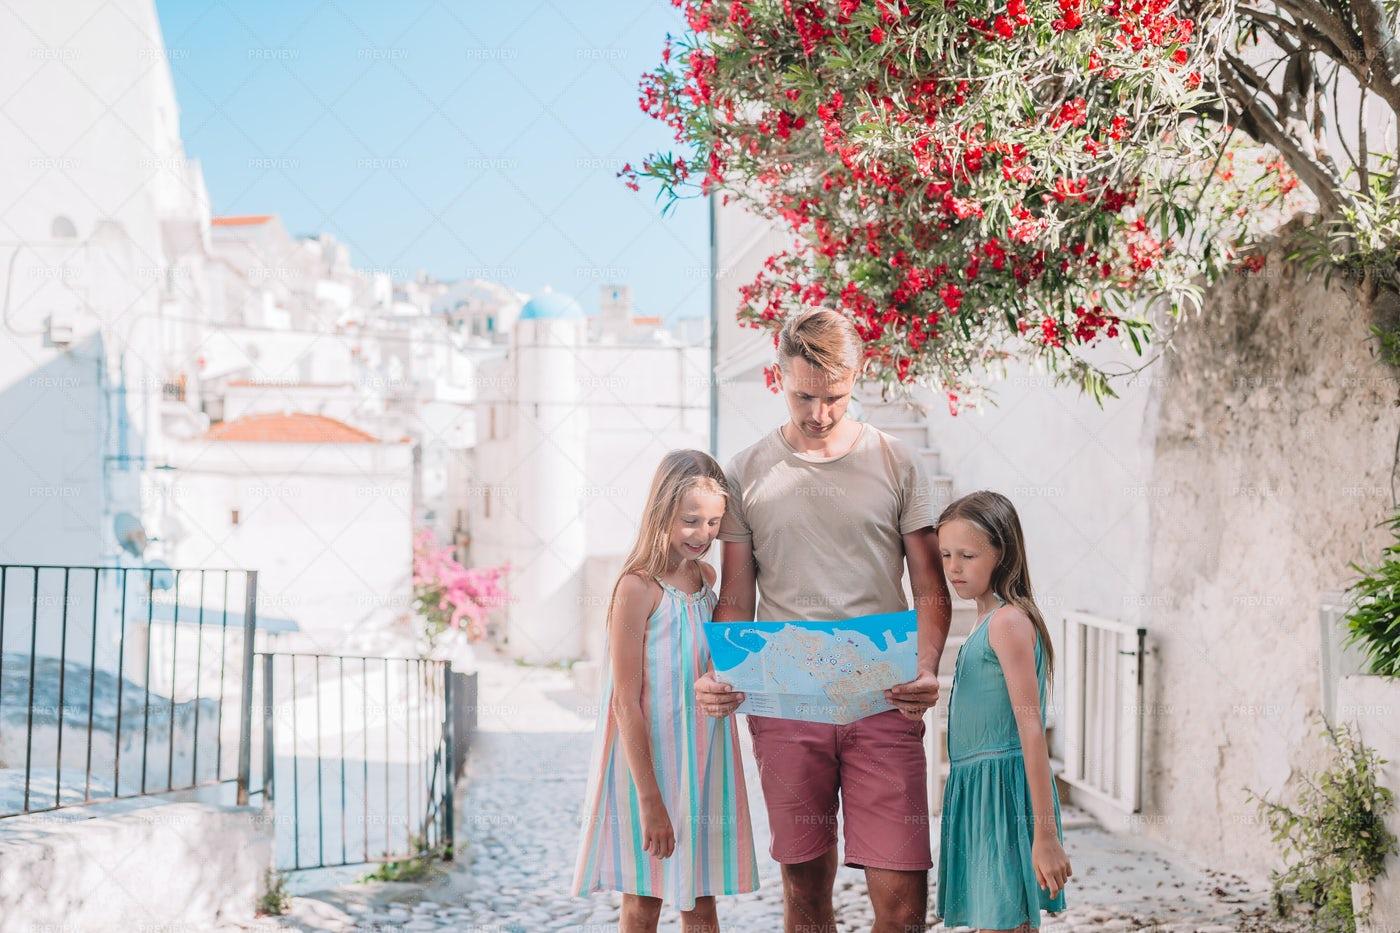 Traveling Family Checks Map: Stock Photos